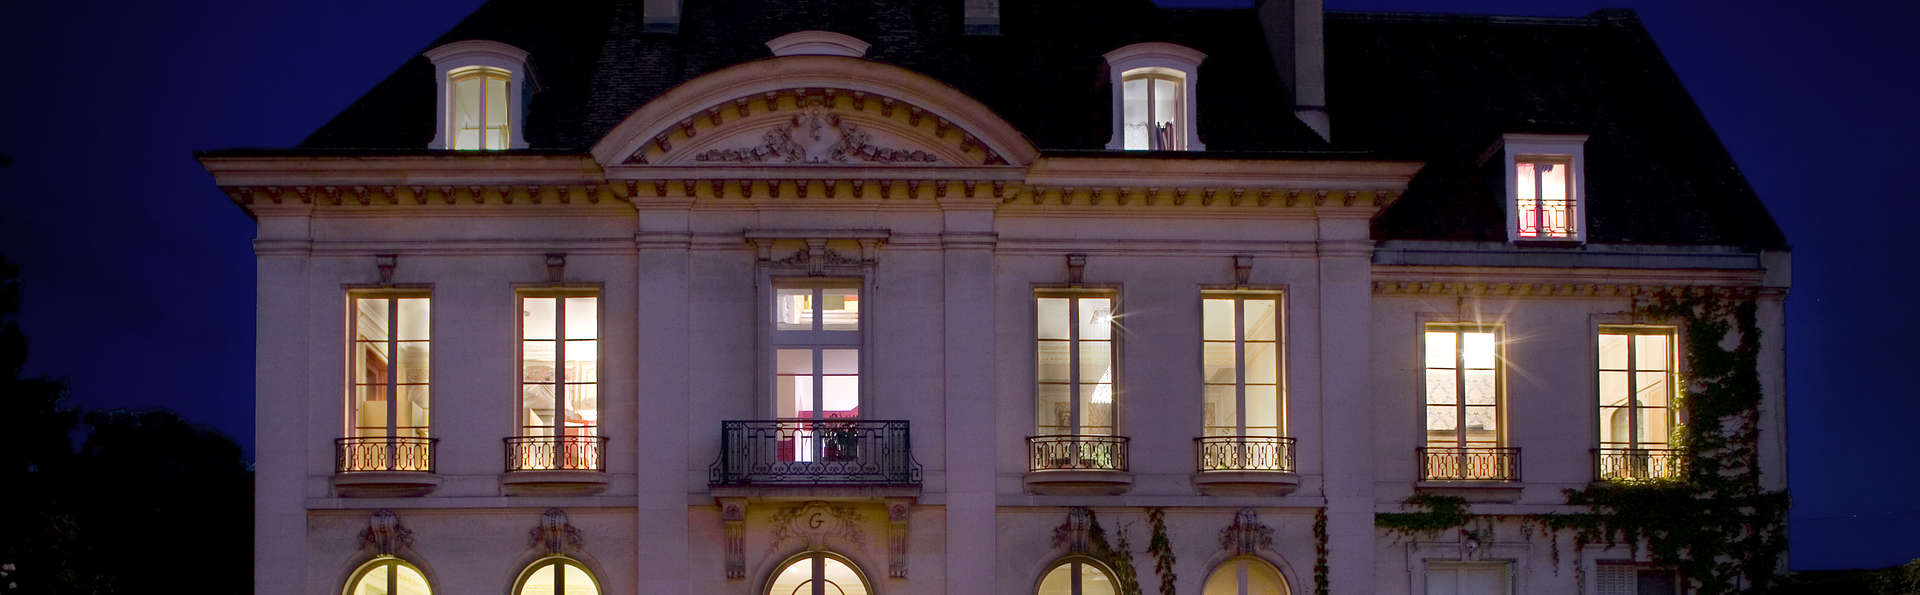 Hôtel Restaurant La Gourmandine - Façade